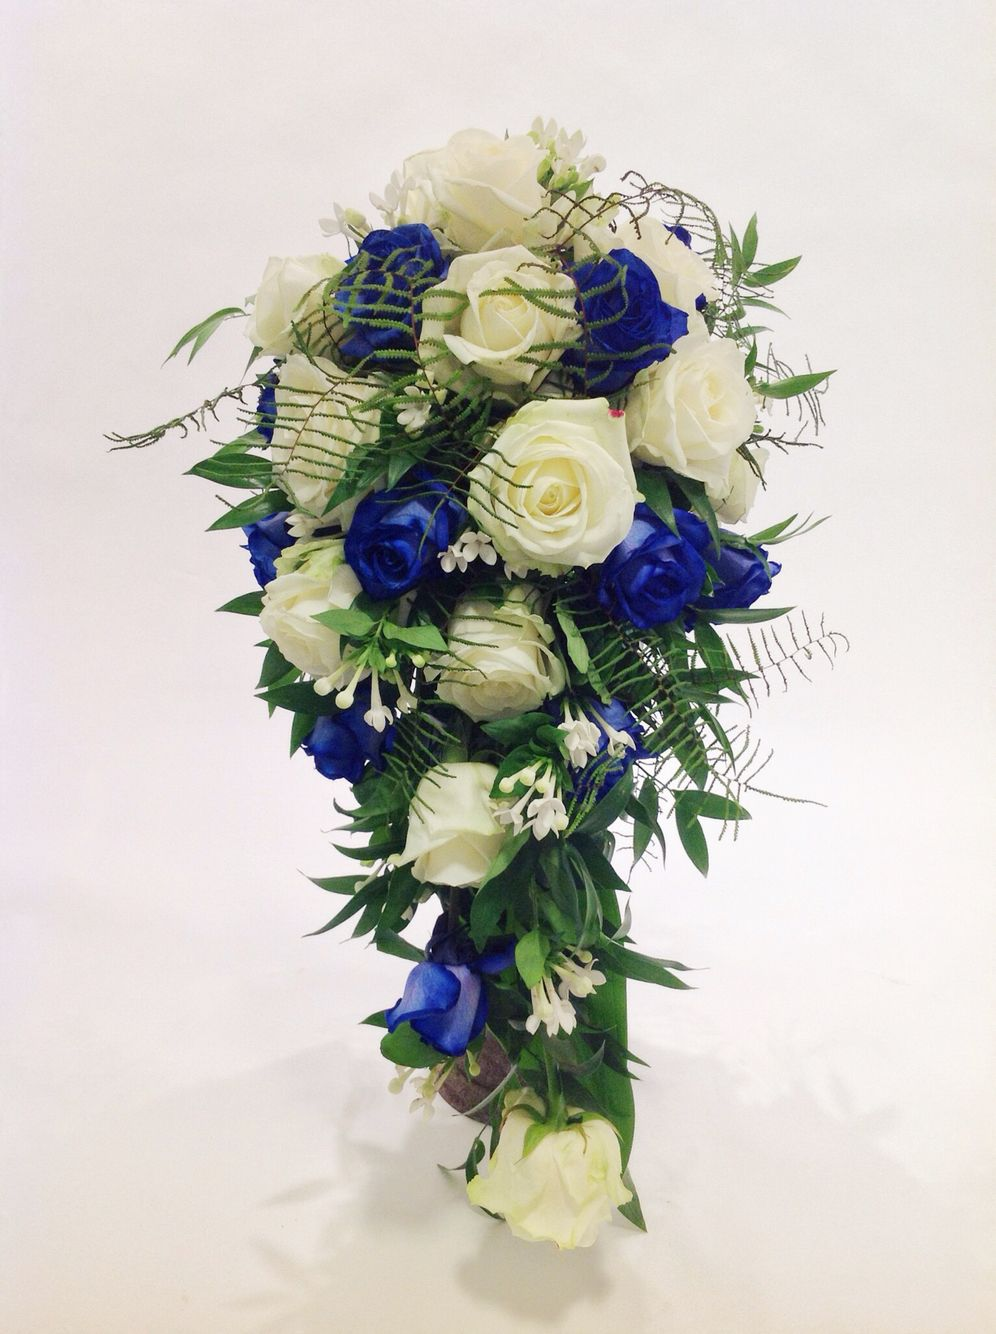 Brautstrau blauwei mit rosen bouvardia und ruscus ramos de brautstrau blauwei mit rosen bouvardia und ruscus izmirmasajfo